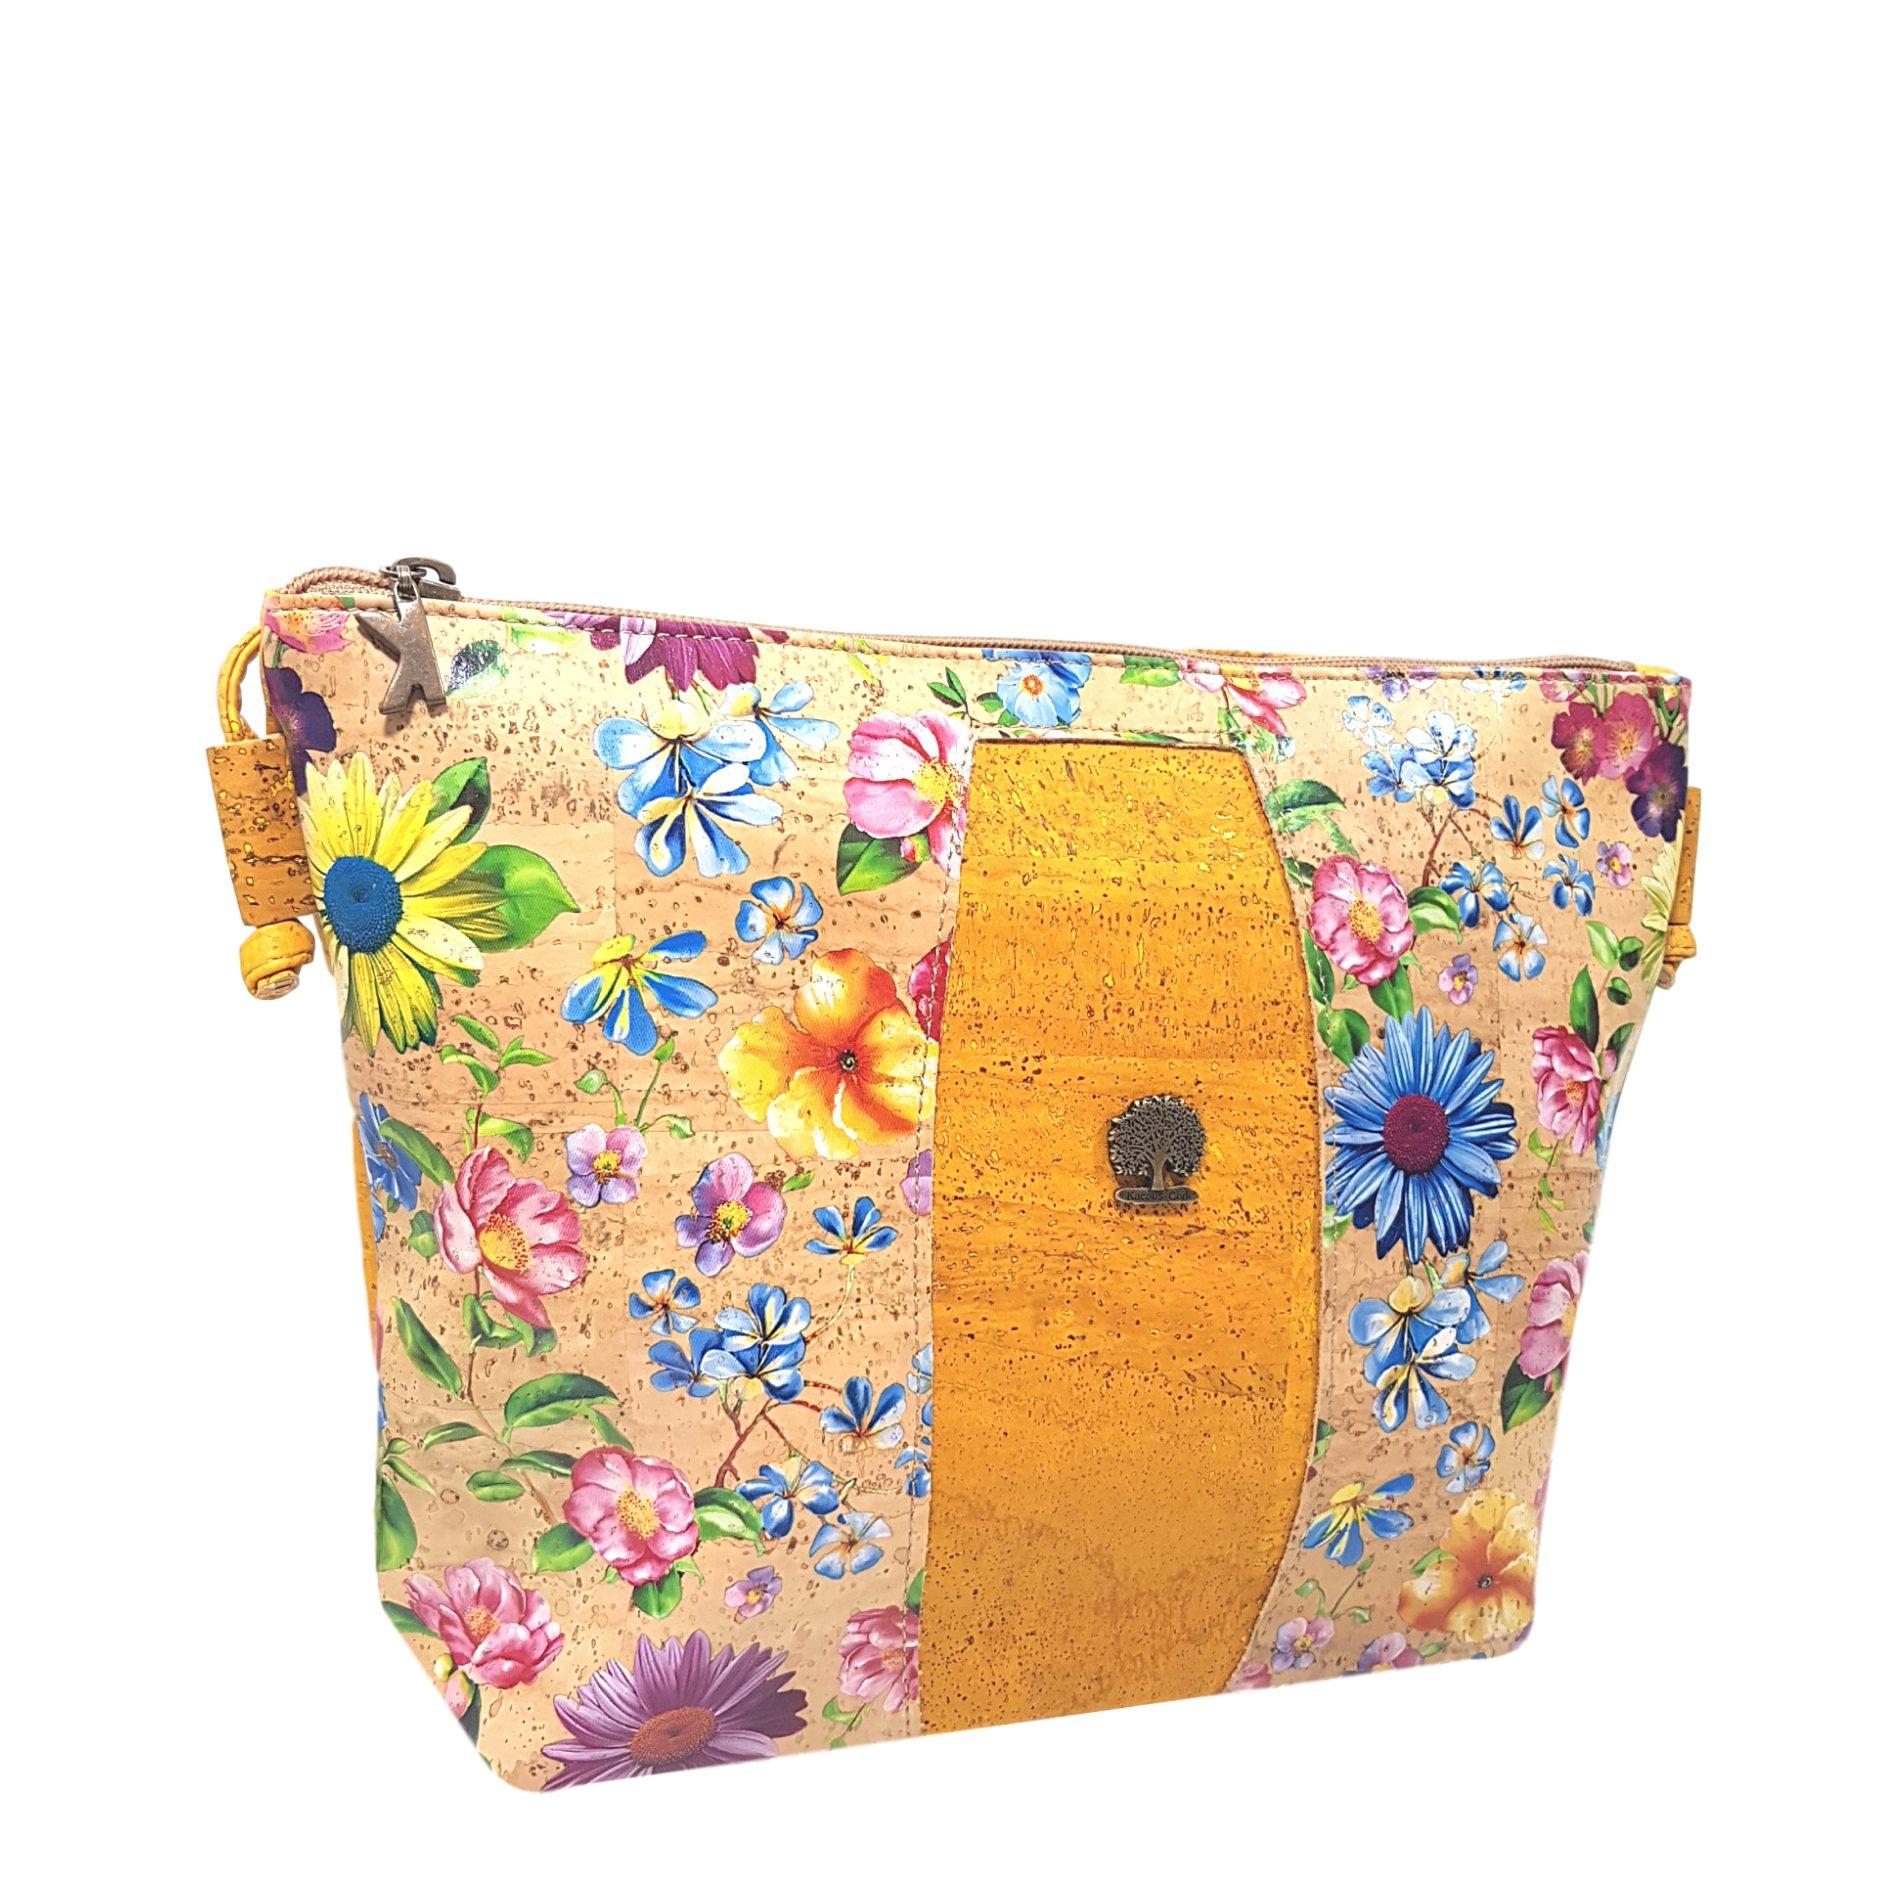 Geanta crossbody galben – flori de camp